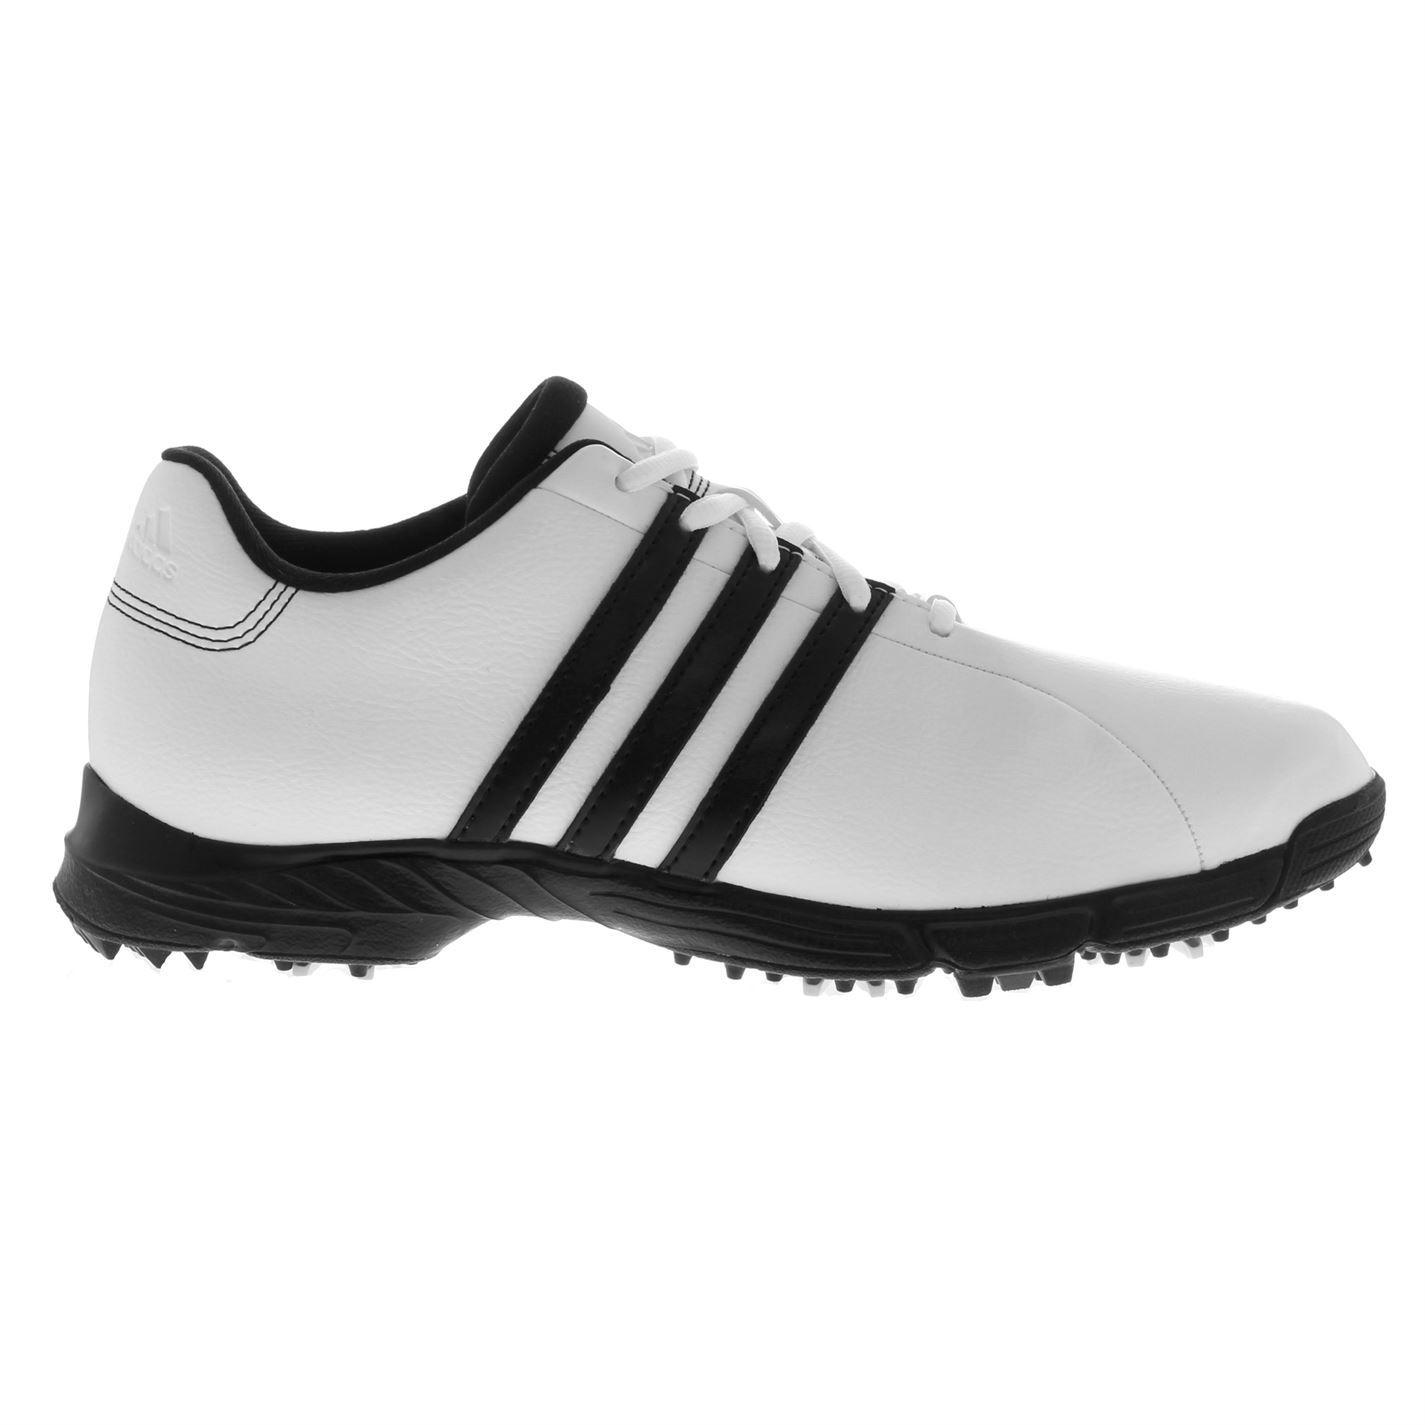 adidas-Golflite-Golf-Shoes-Mens-Spikes-Footwear thumbnail 21